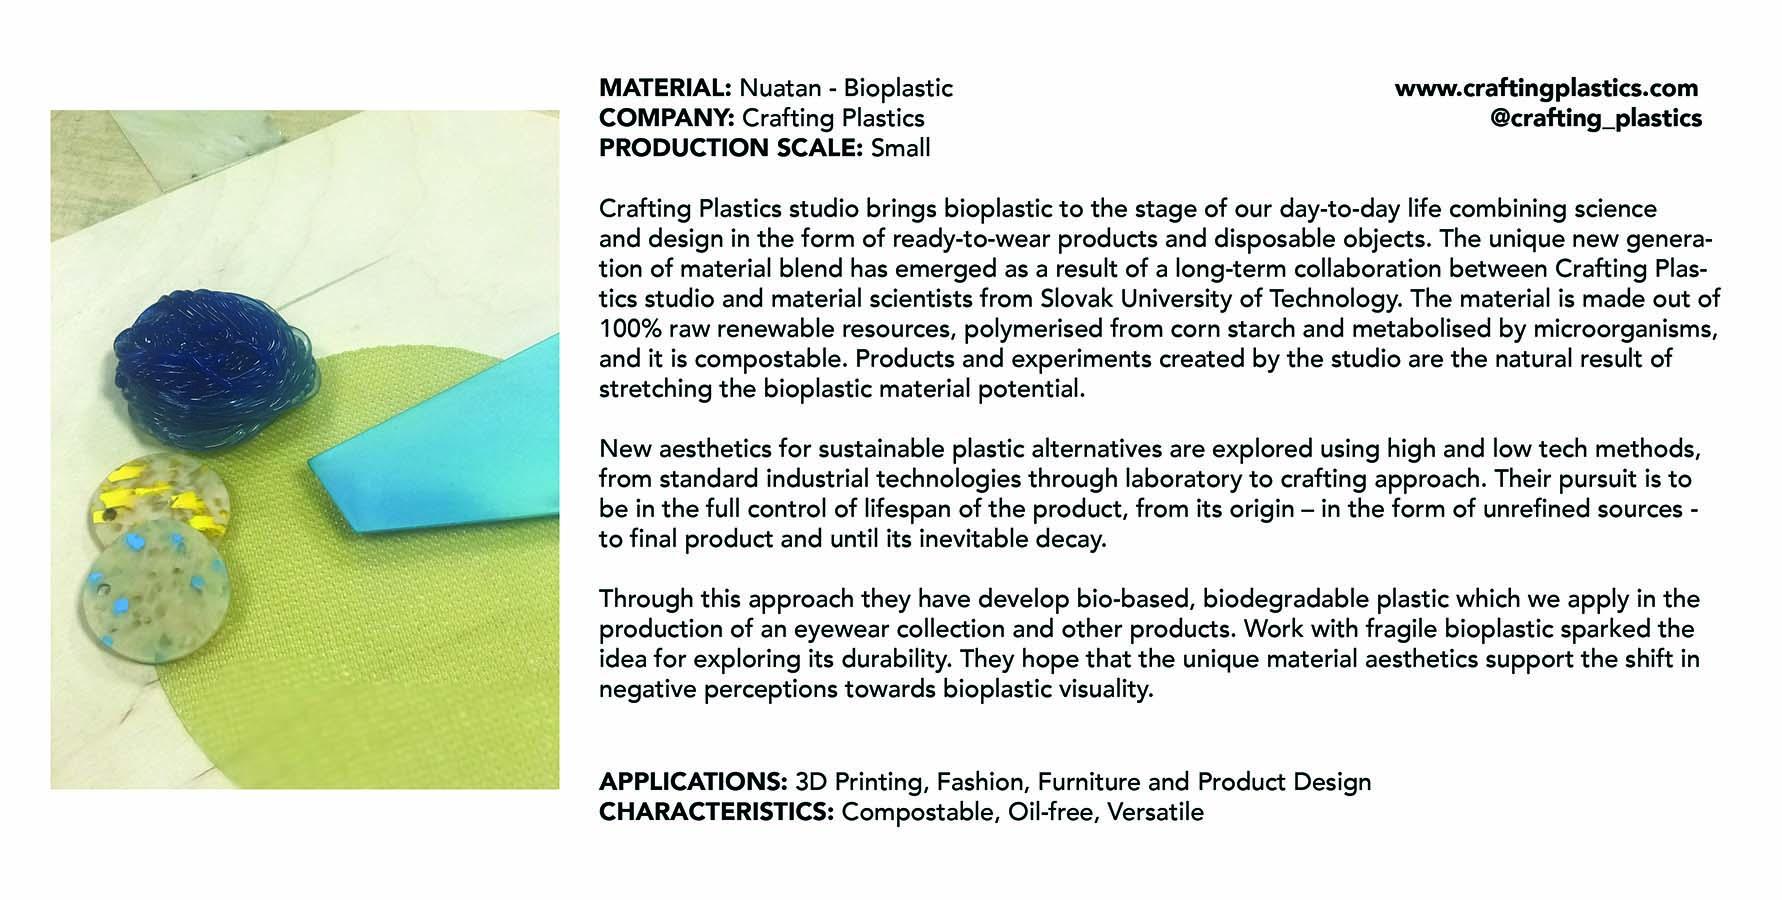 nuatancraftingplastics.jpg